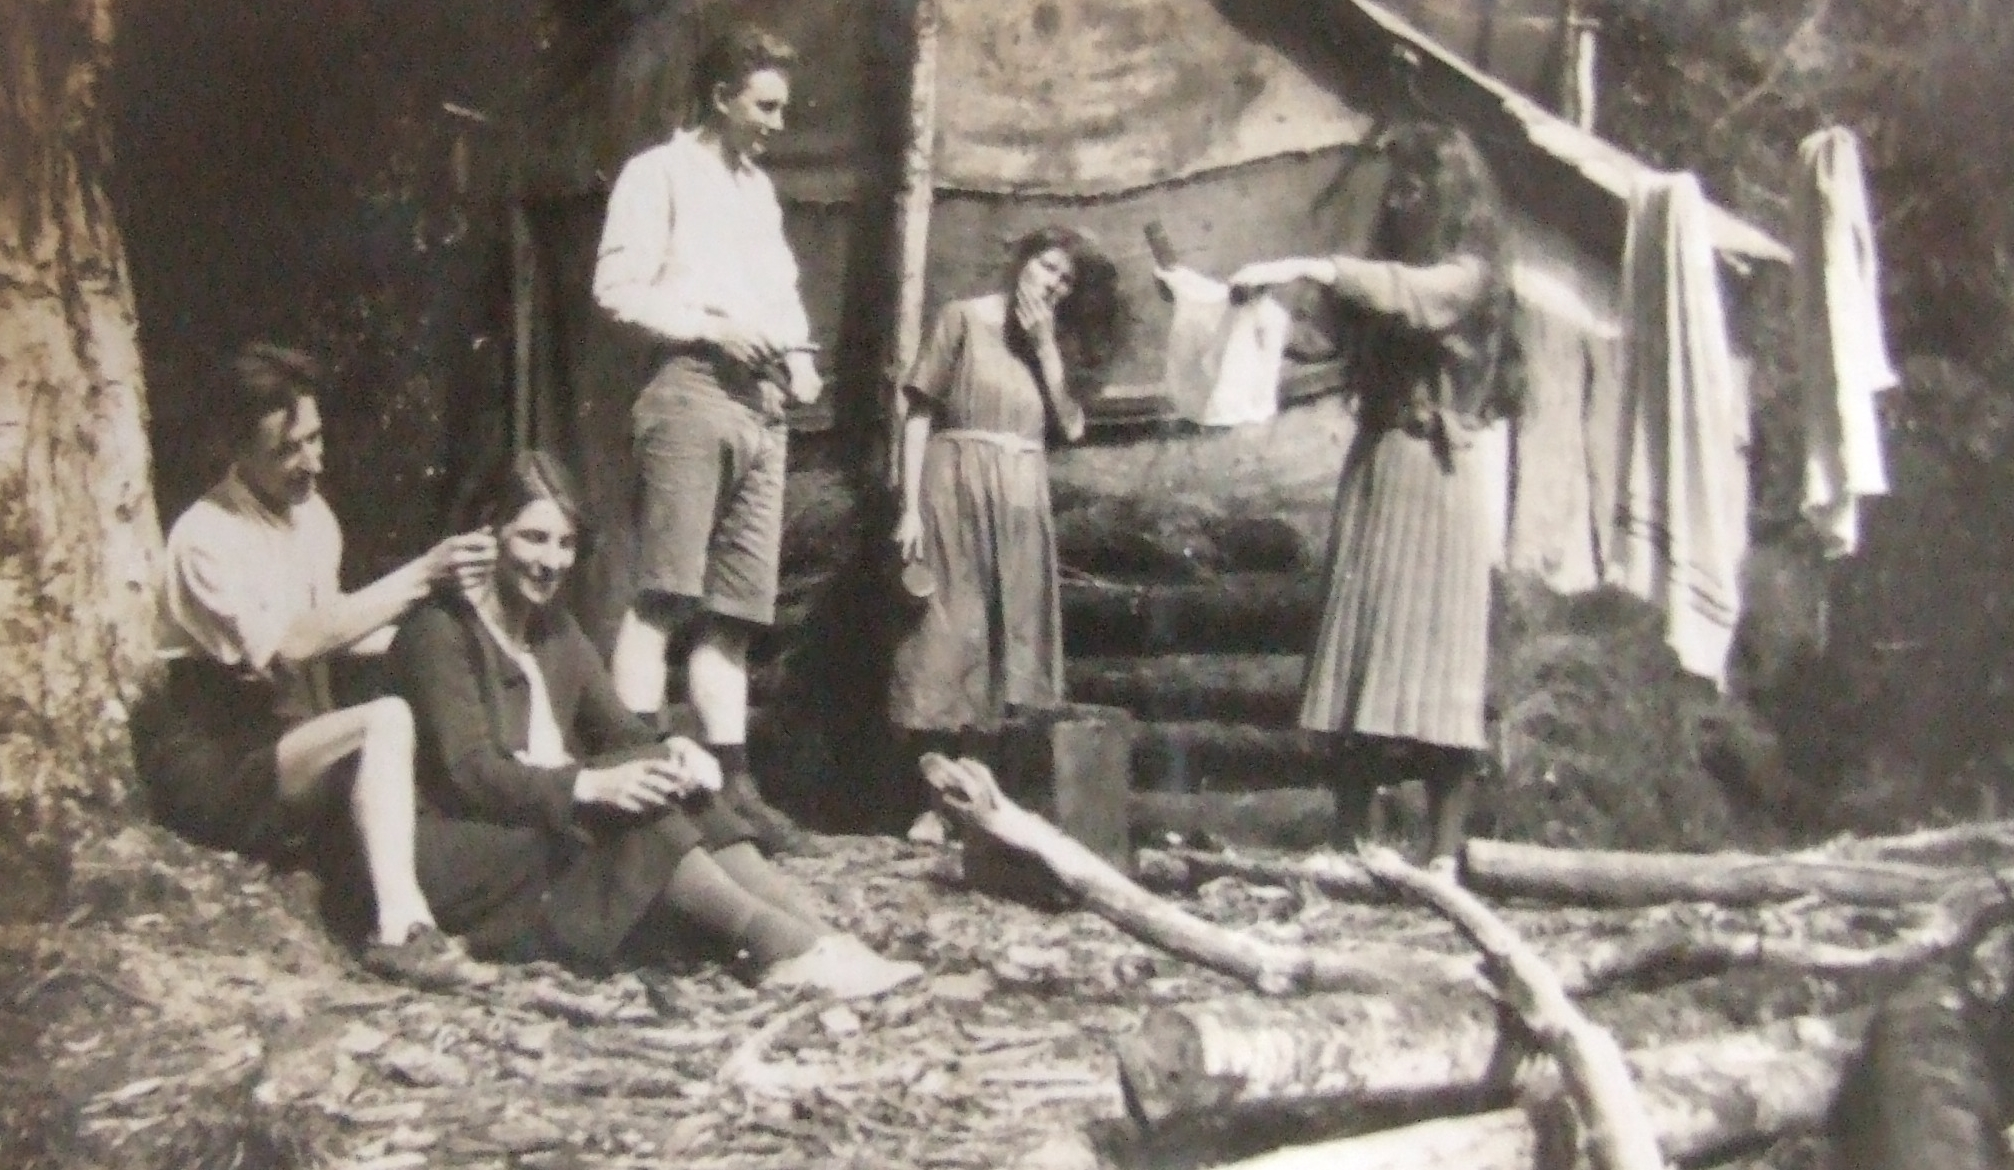 'Toilet Scenes' 1922 Baines Hut